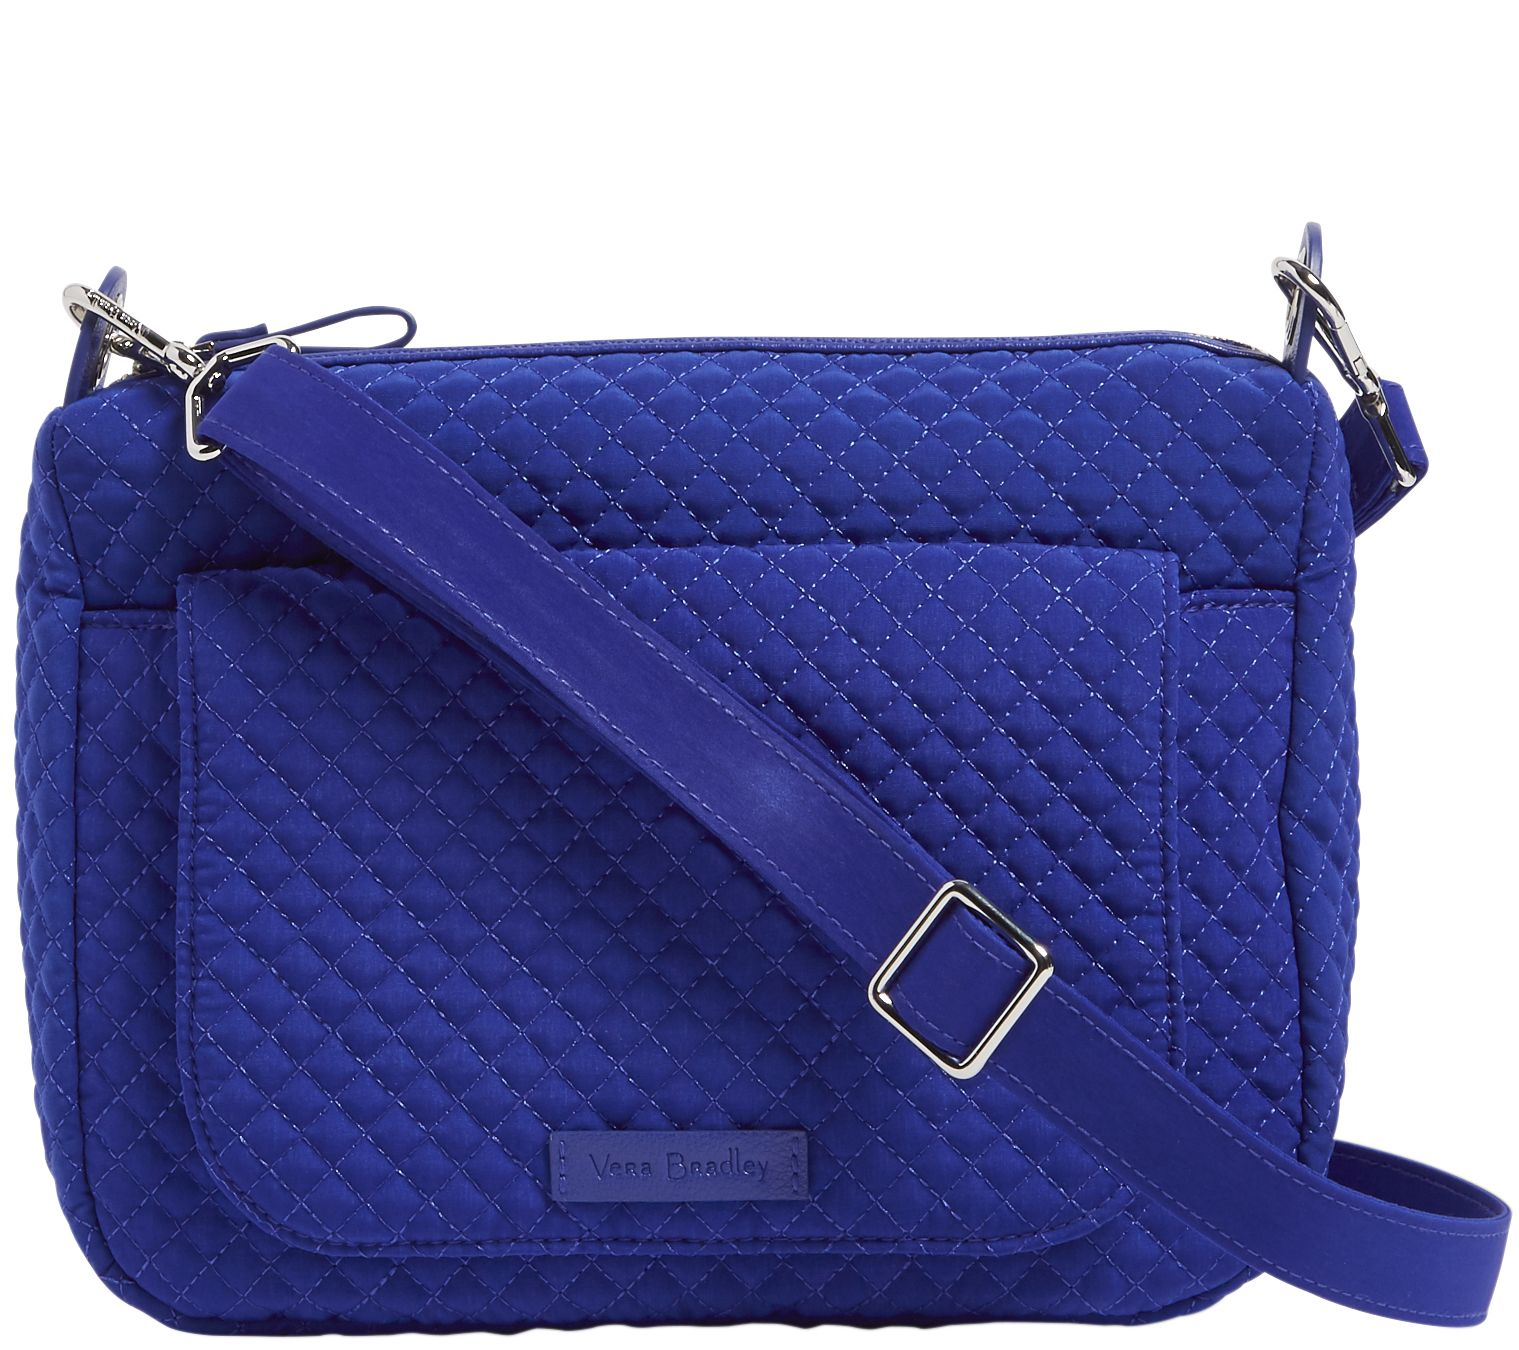 Vera Bradley Microfiber Carson Mini Shoulder Bag - Page 1 — QVC.com 410304dd39def